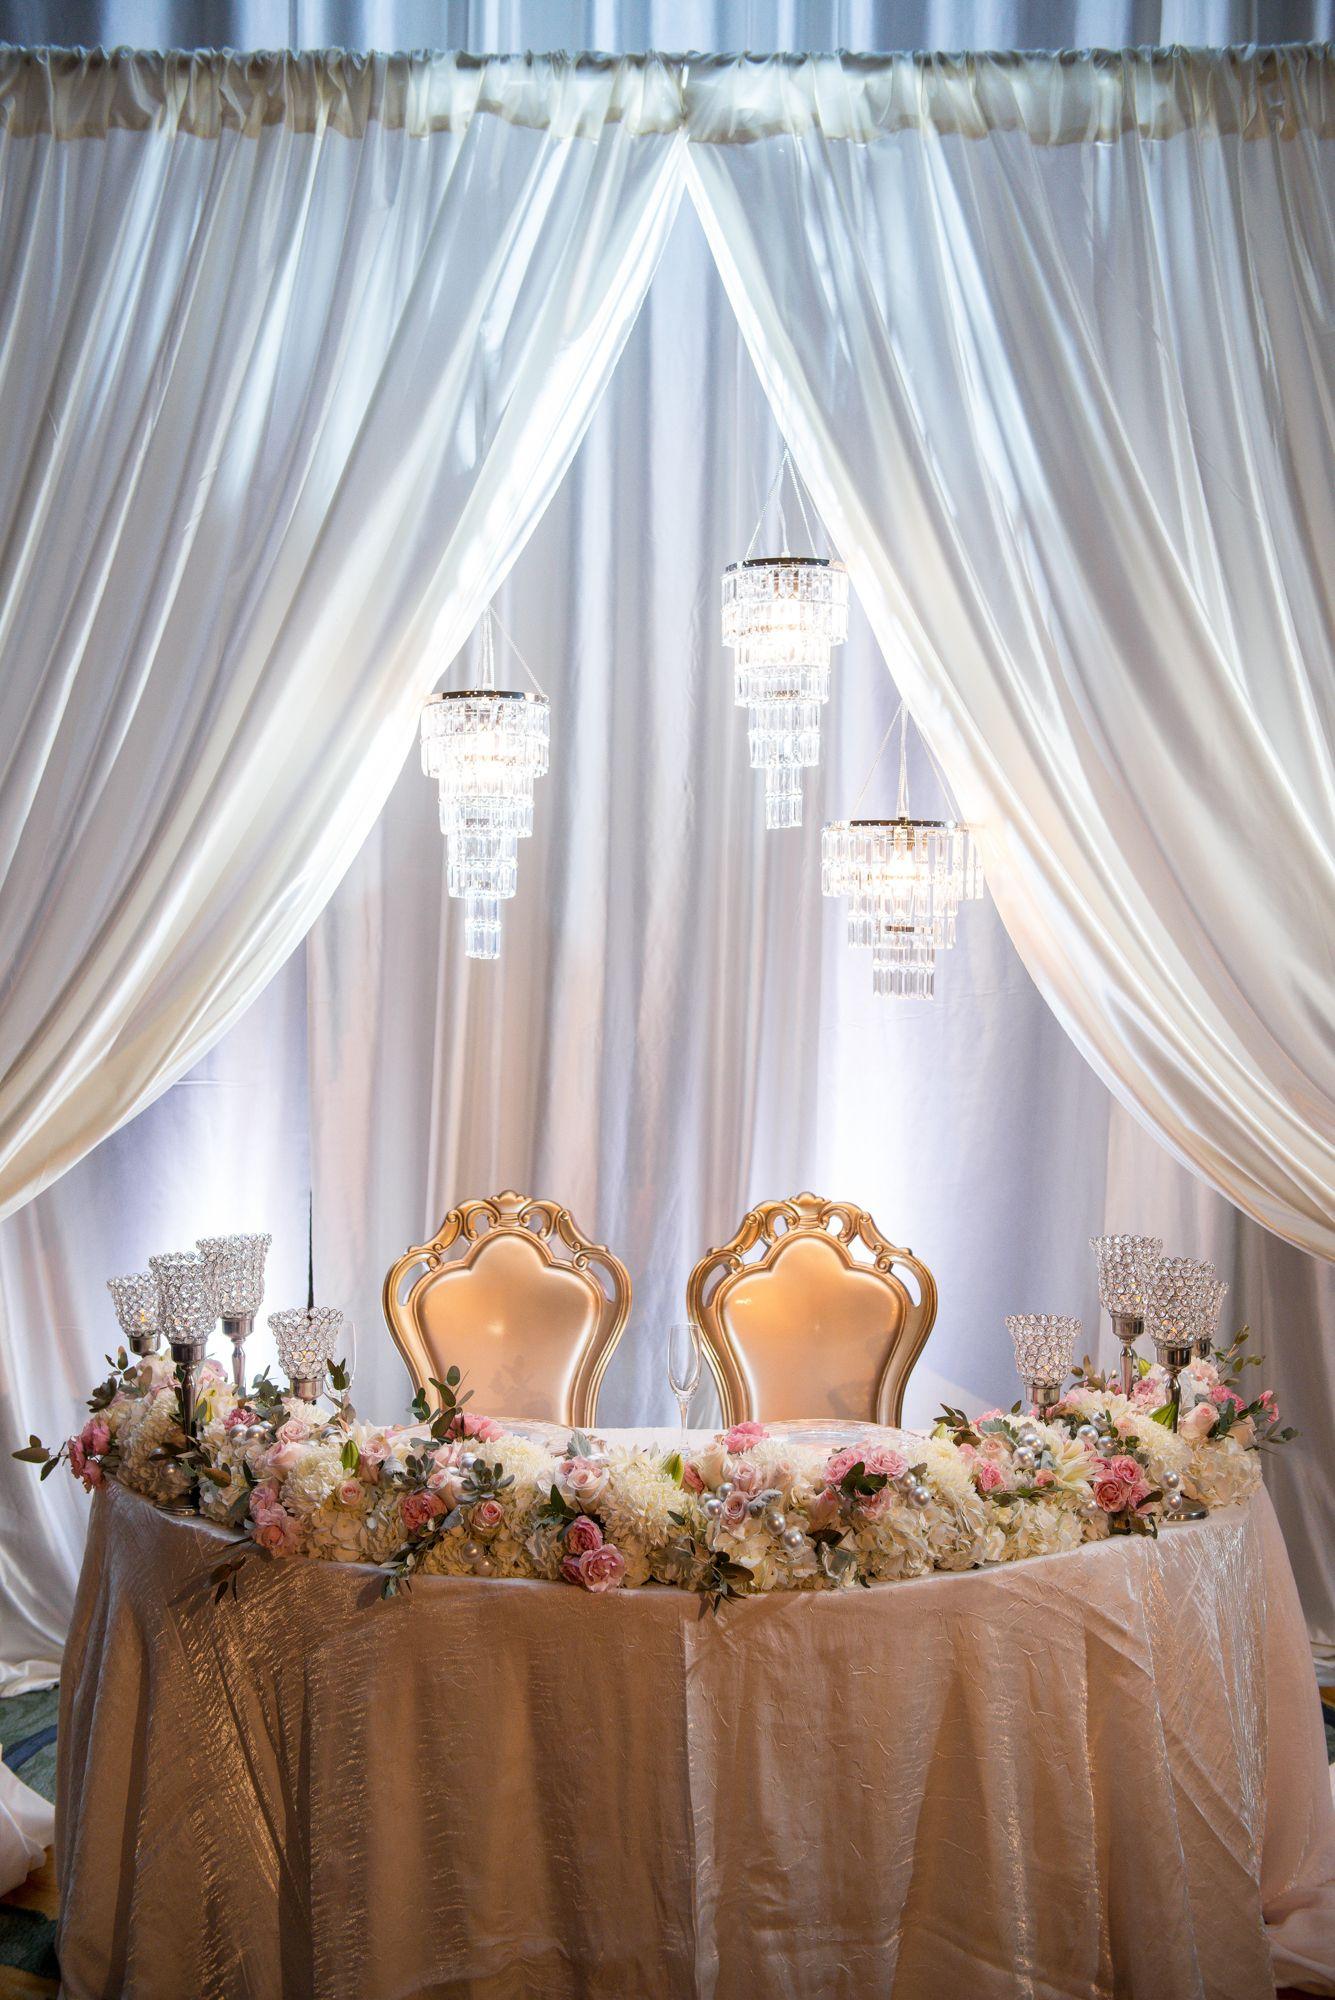 Disneyland photos disneyland paris bride groom table grooms table - Walt Disney World Wedding Spotlight Kim And Ronnie